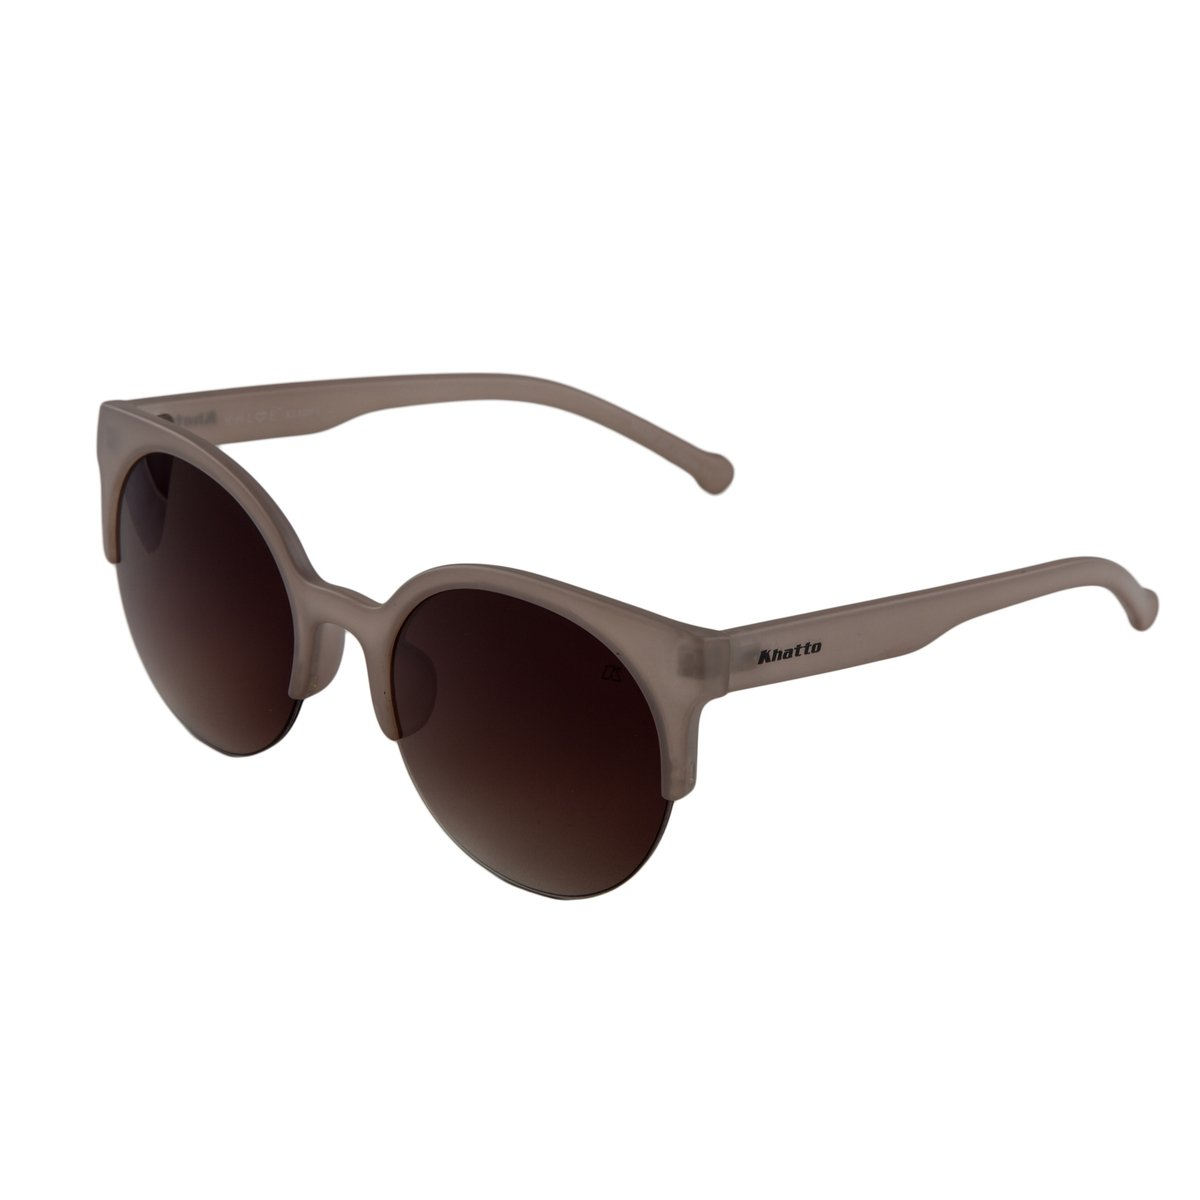 Óculos de Sol Khatto 32058 - Compre Agora   Netshoes 566034034e